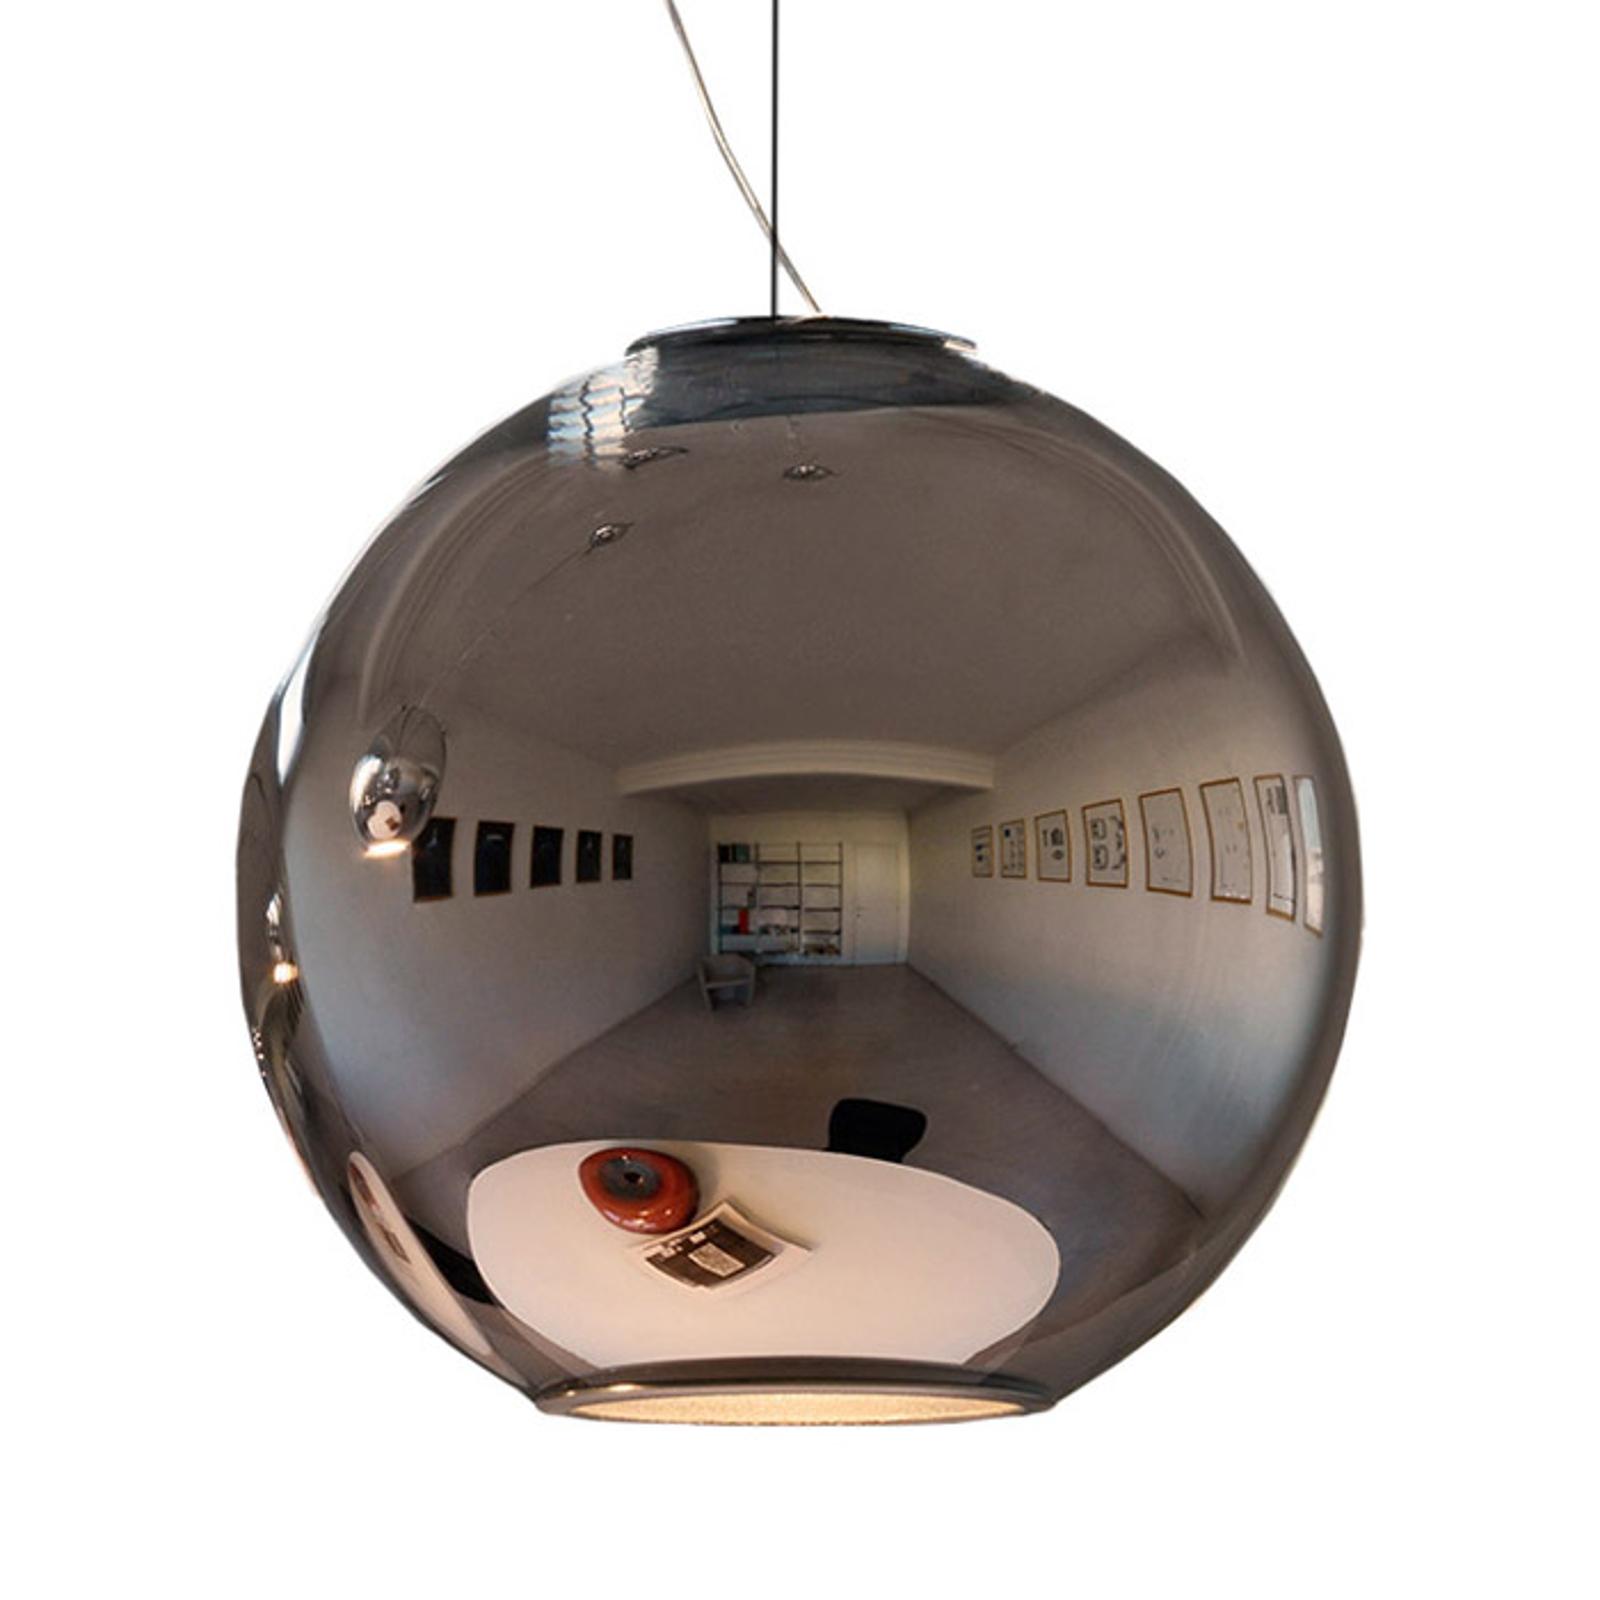 Designerska lampa wisząca GLOBO DI LUCE, śr. 45 cm